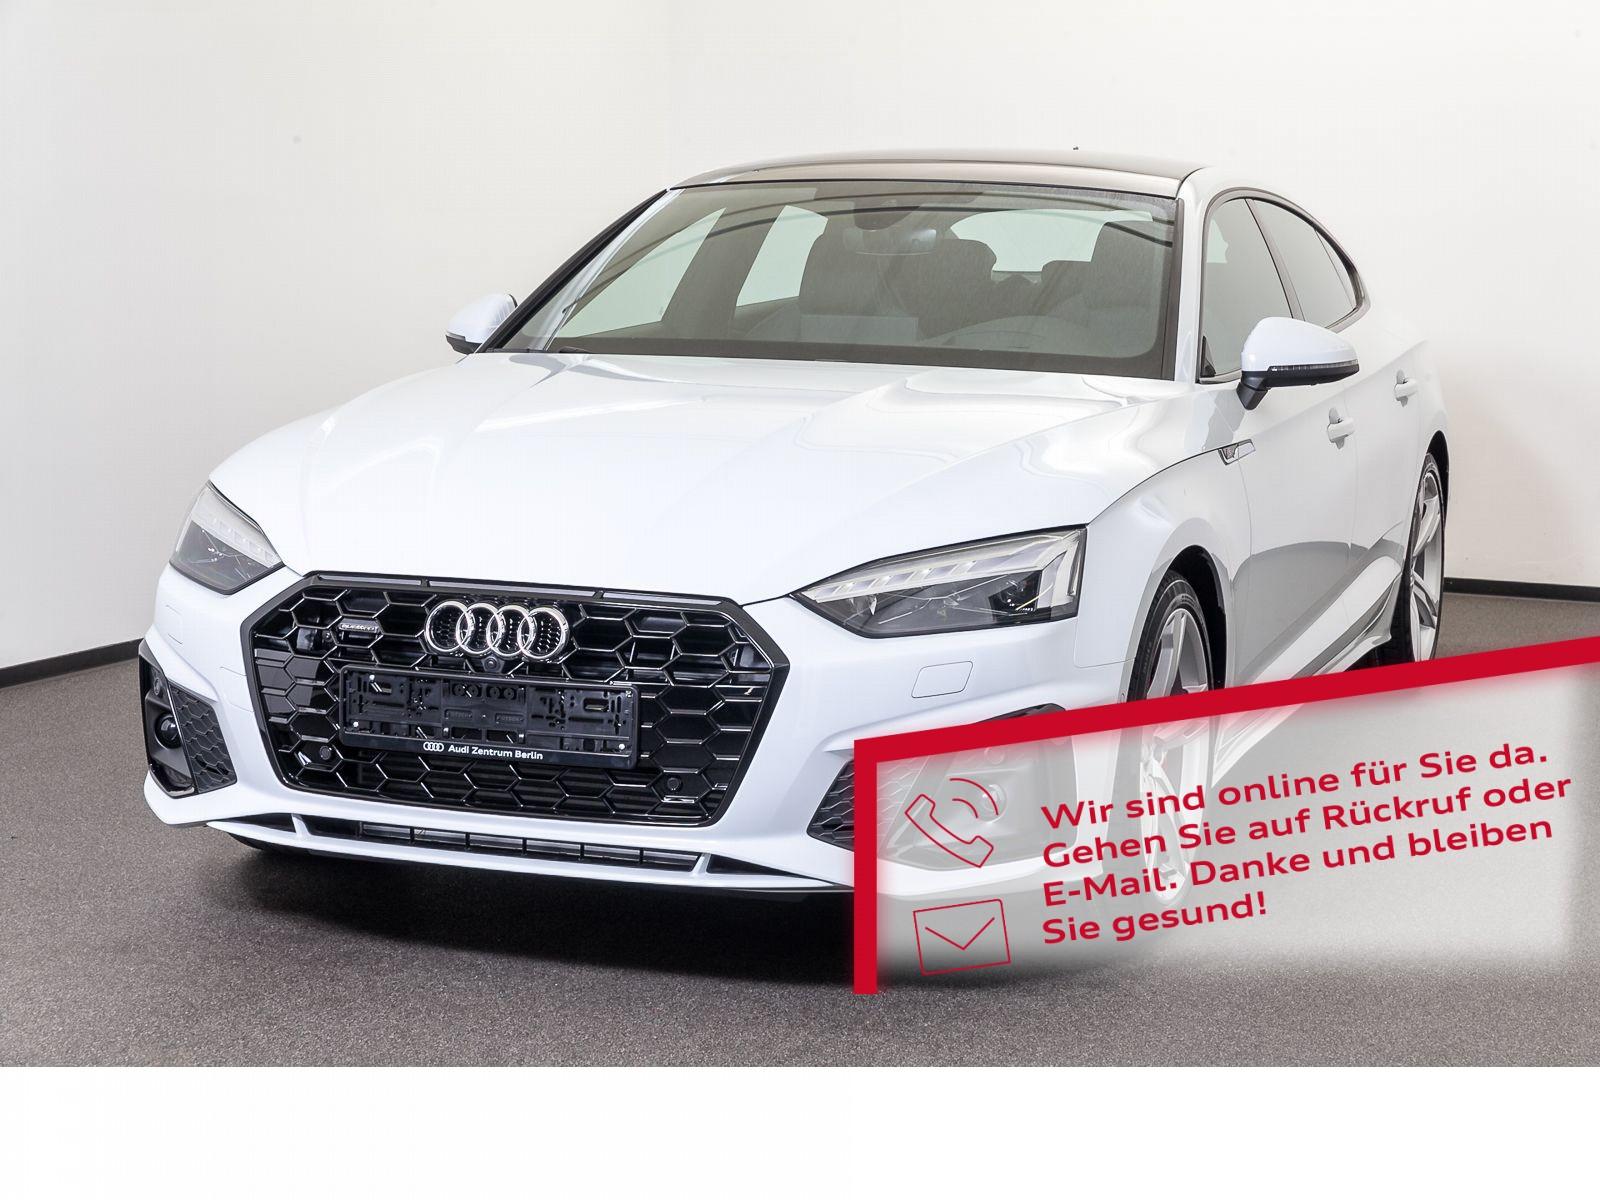 Audi A5 Sportback S line 45 TFSI quattro S tronic, Jahr 2020, Benzin